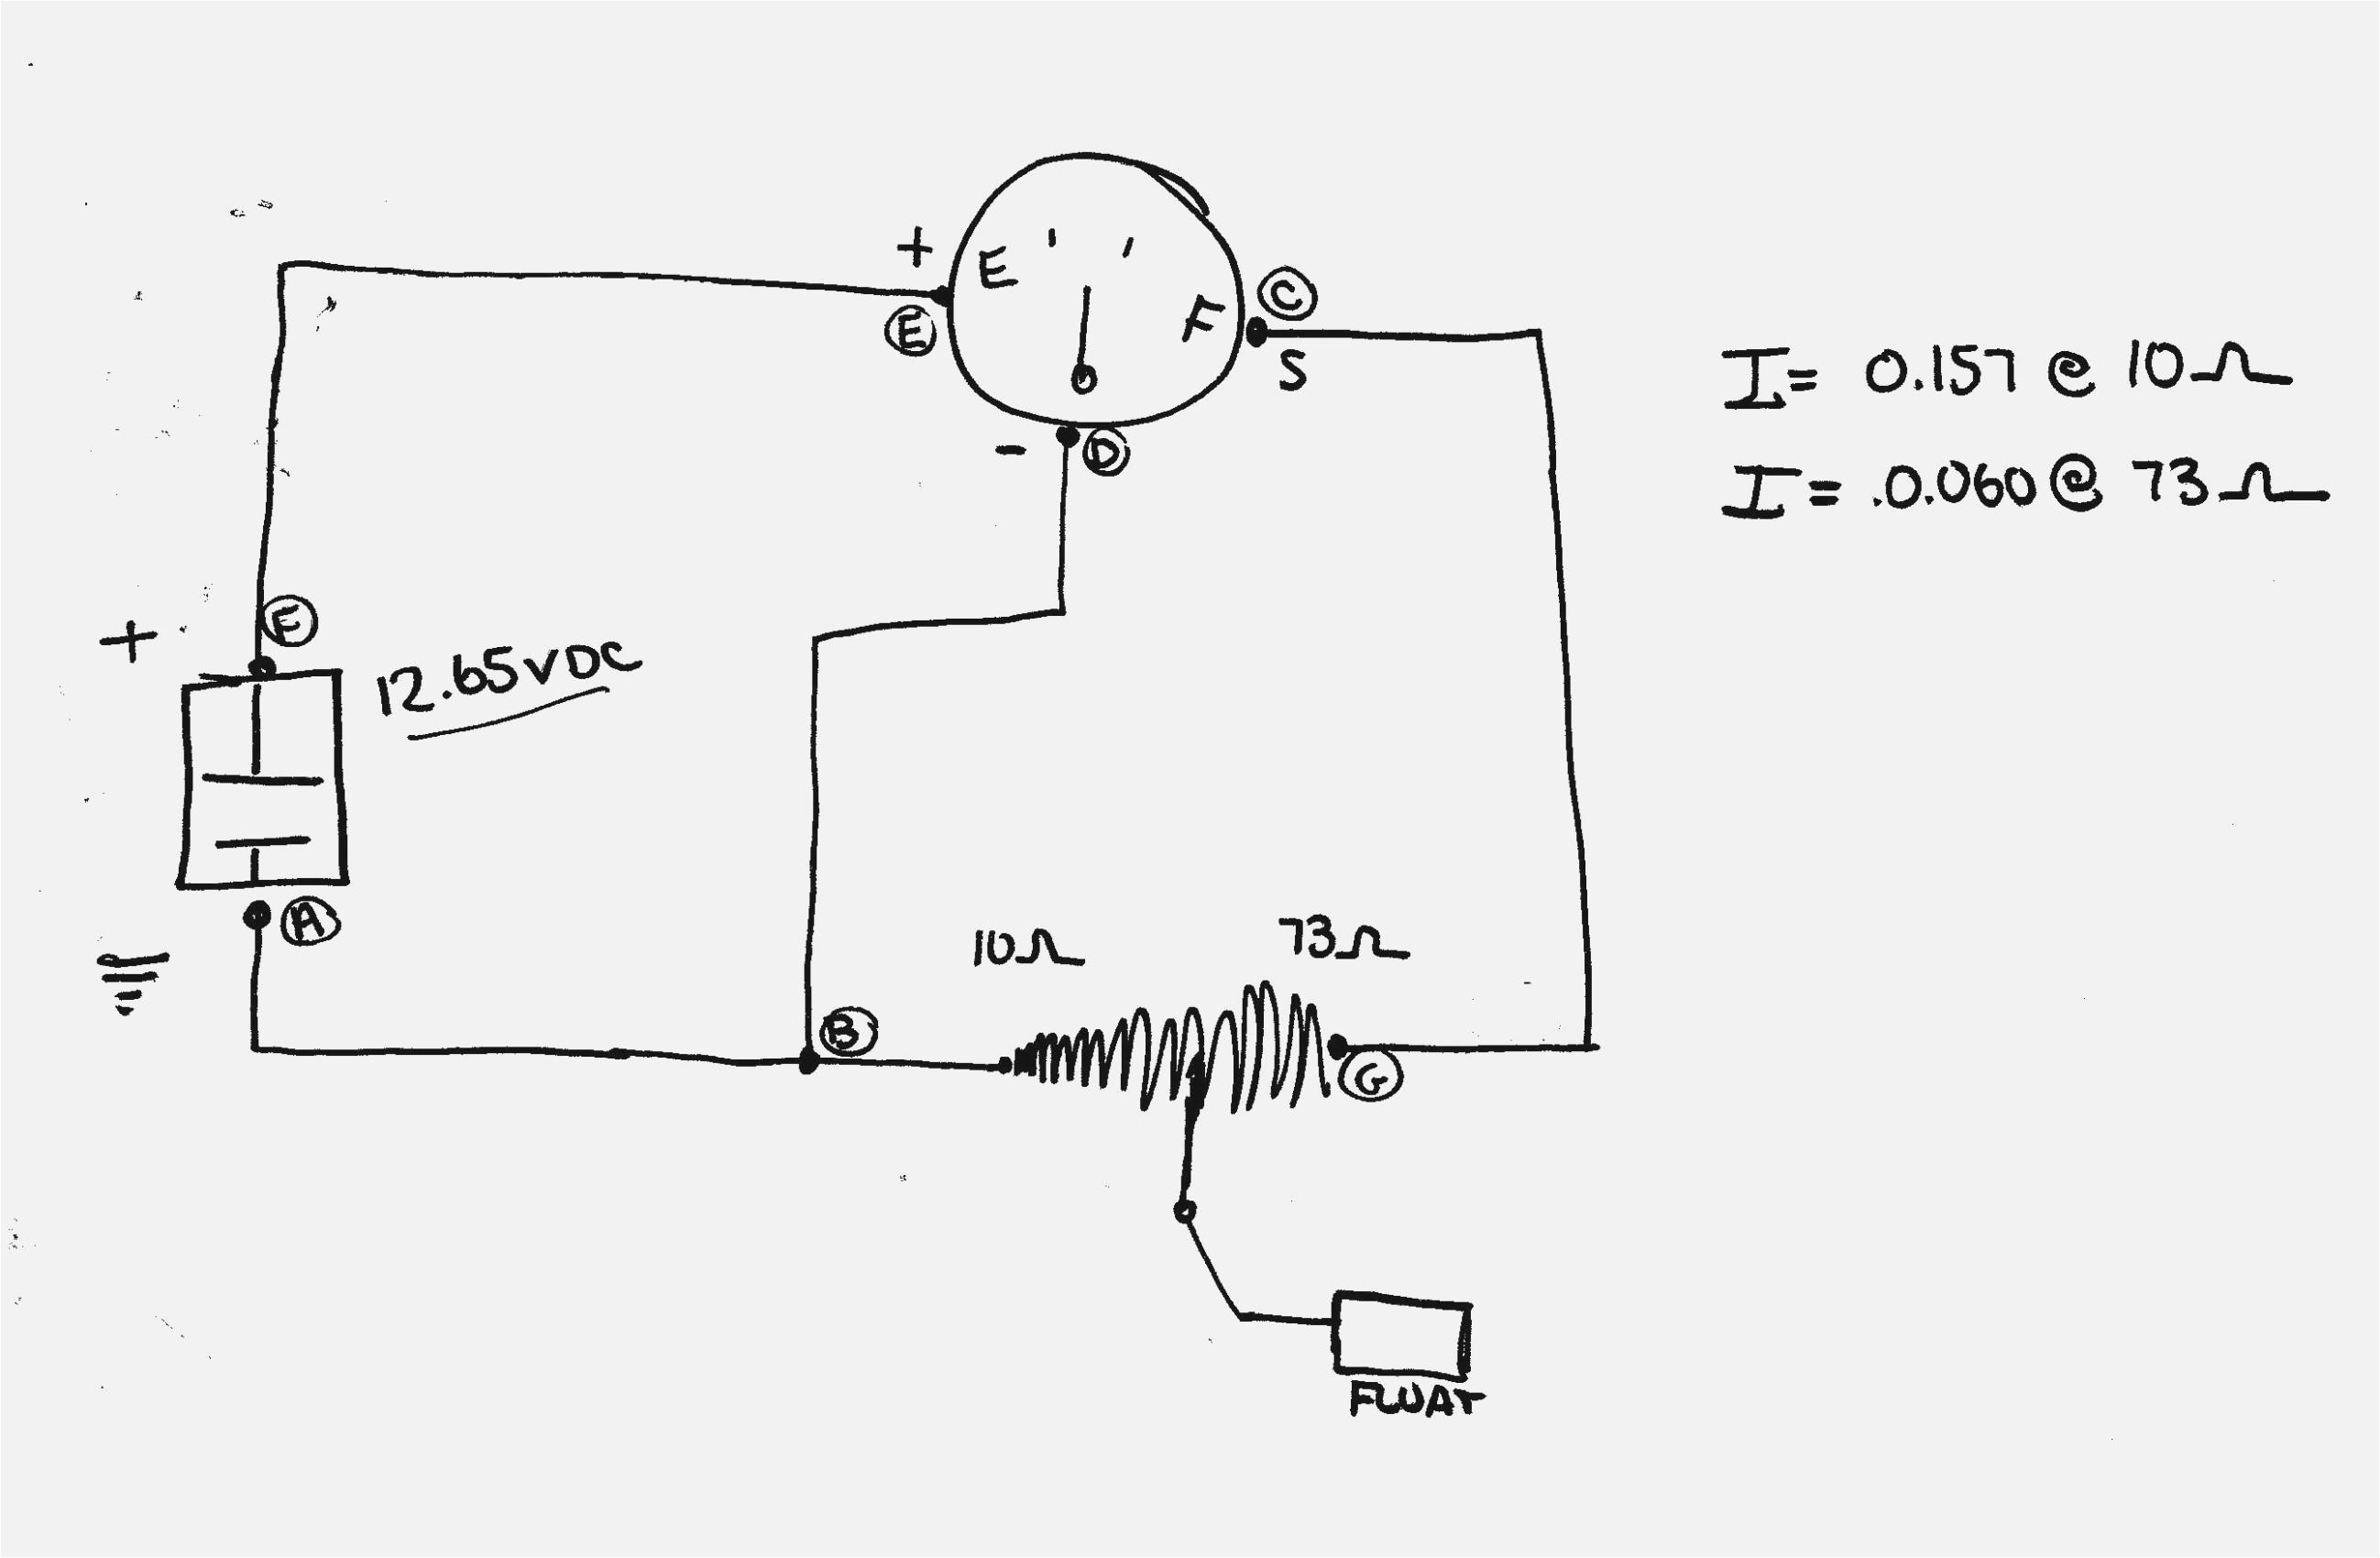 wiring diagram fuel gauge wiring diagram expert moeller fuel gauge wiring diagram wiring boat gauges diagram